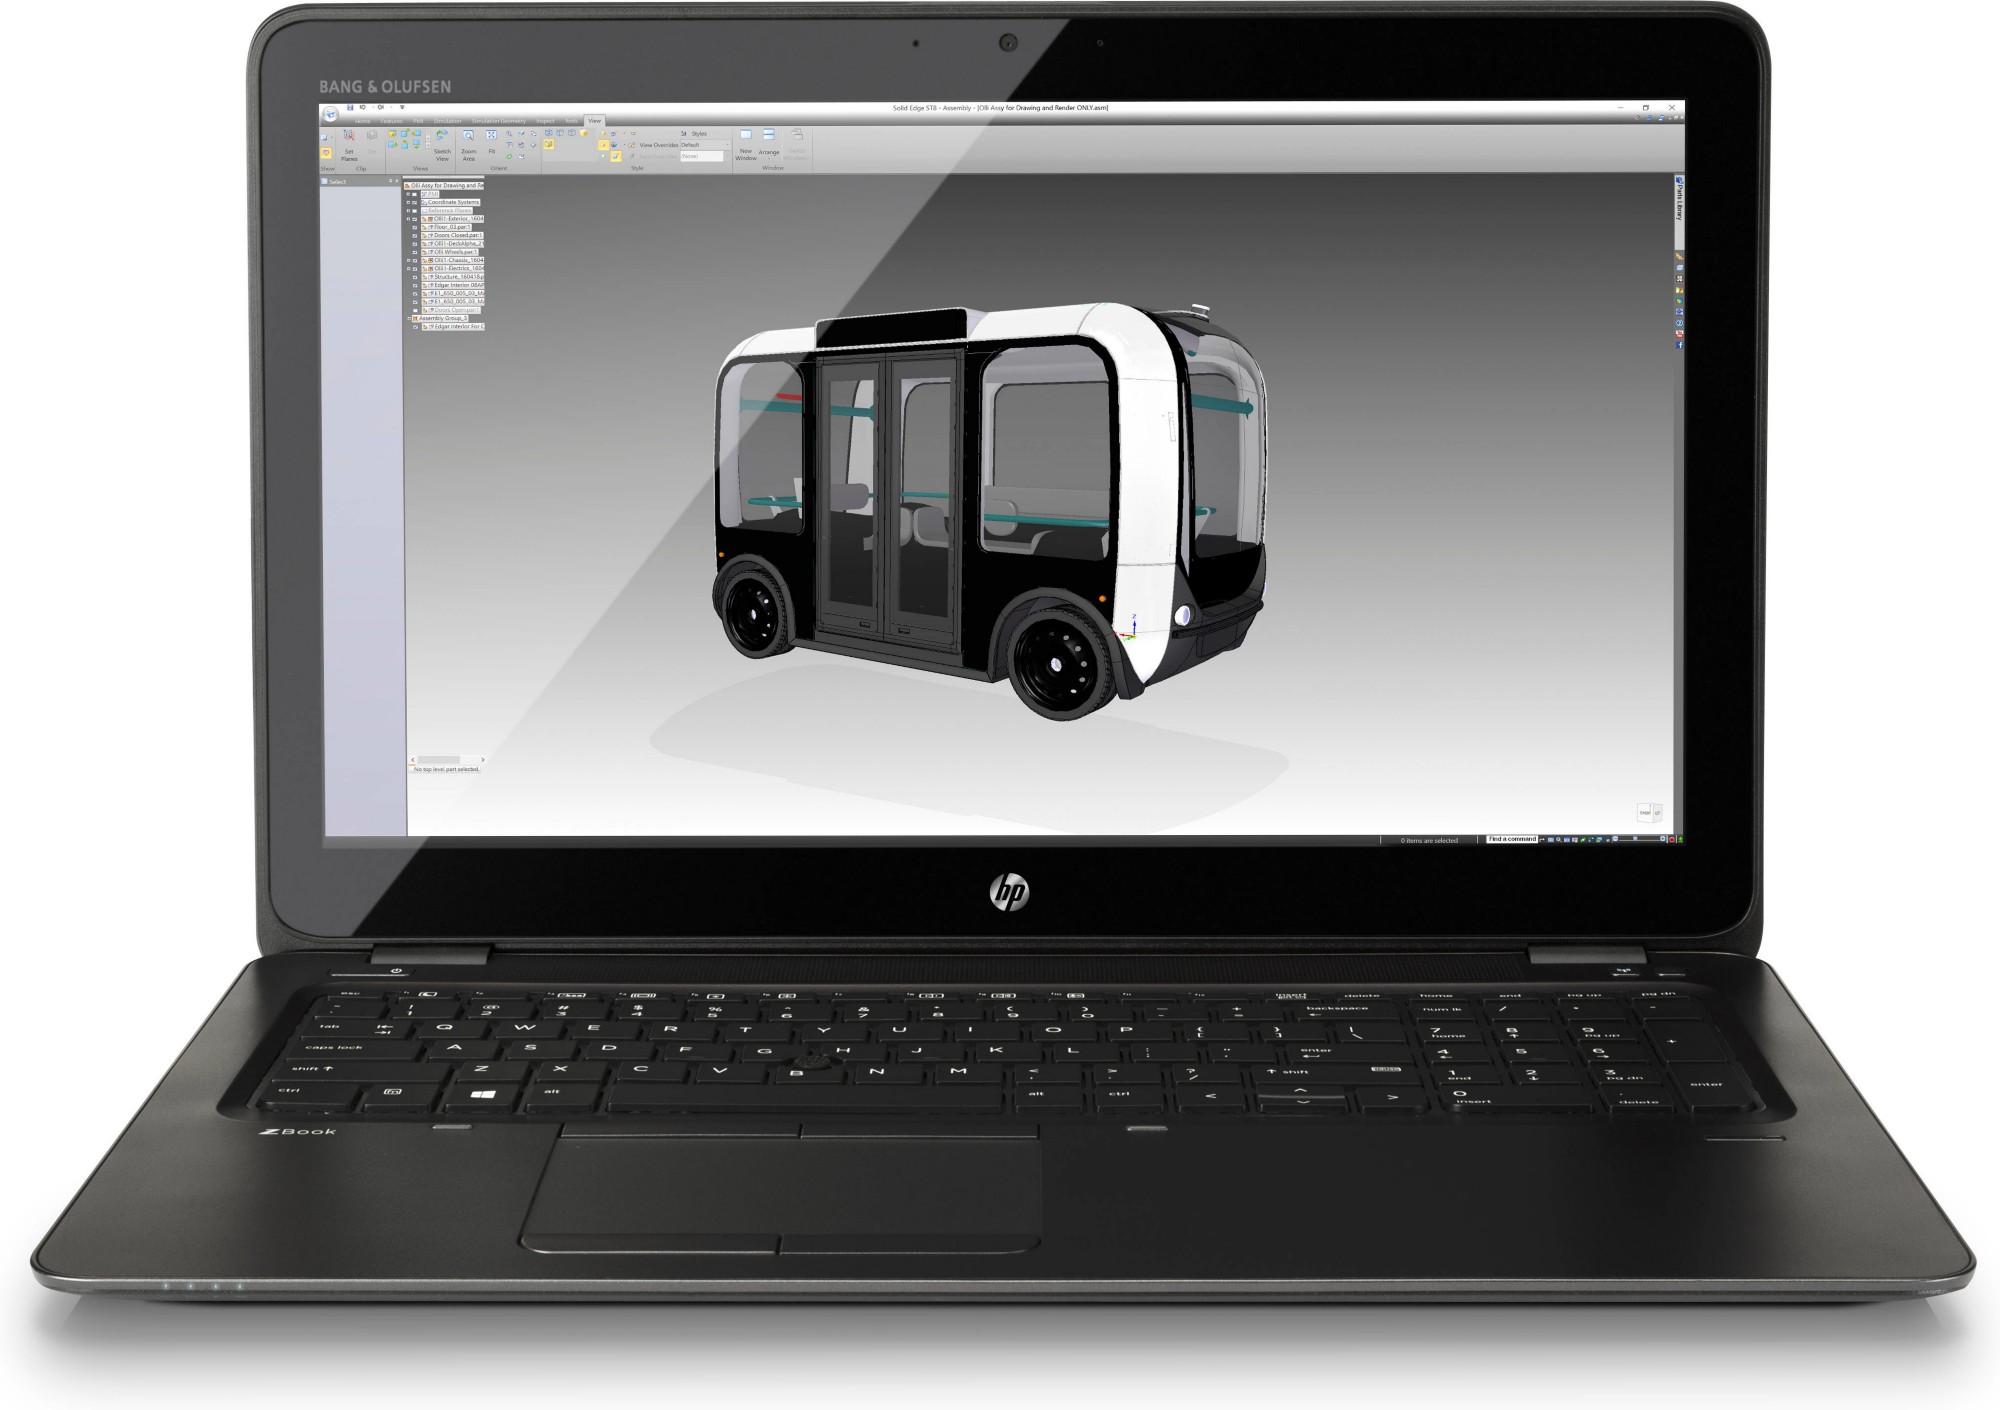 HP ZBook 15u G4 Y6K02EA#ABU Core i7-7500U 16GB 512GB SSD 15.6IN BT CAM Win 10 Pro